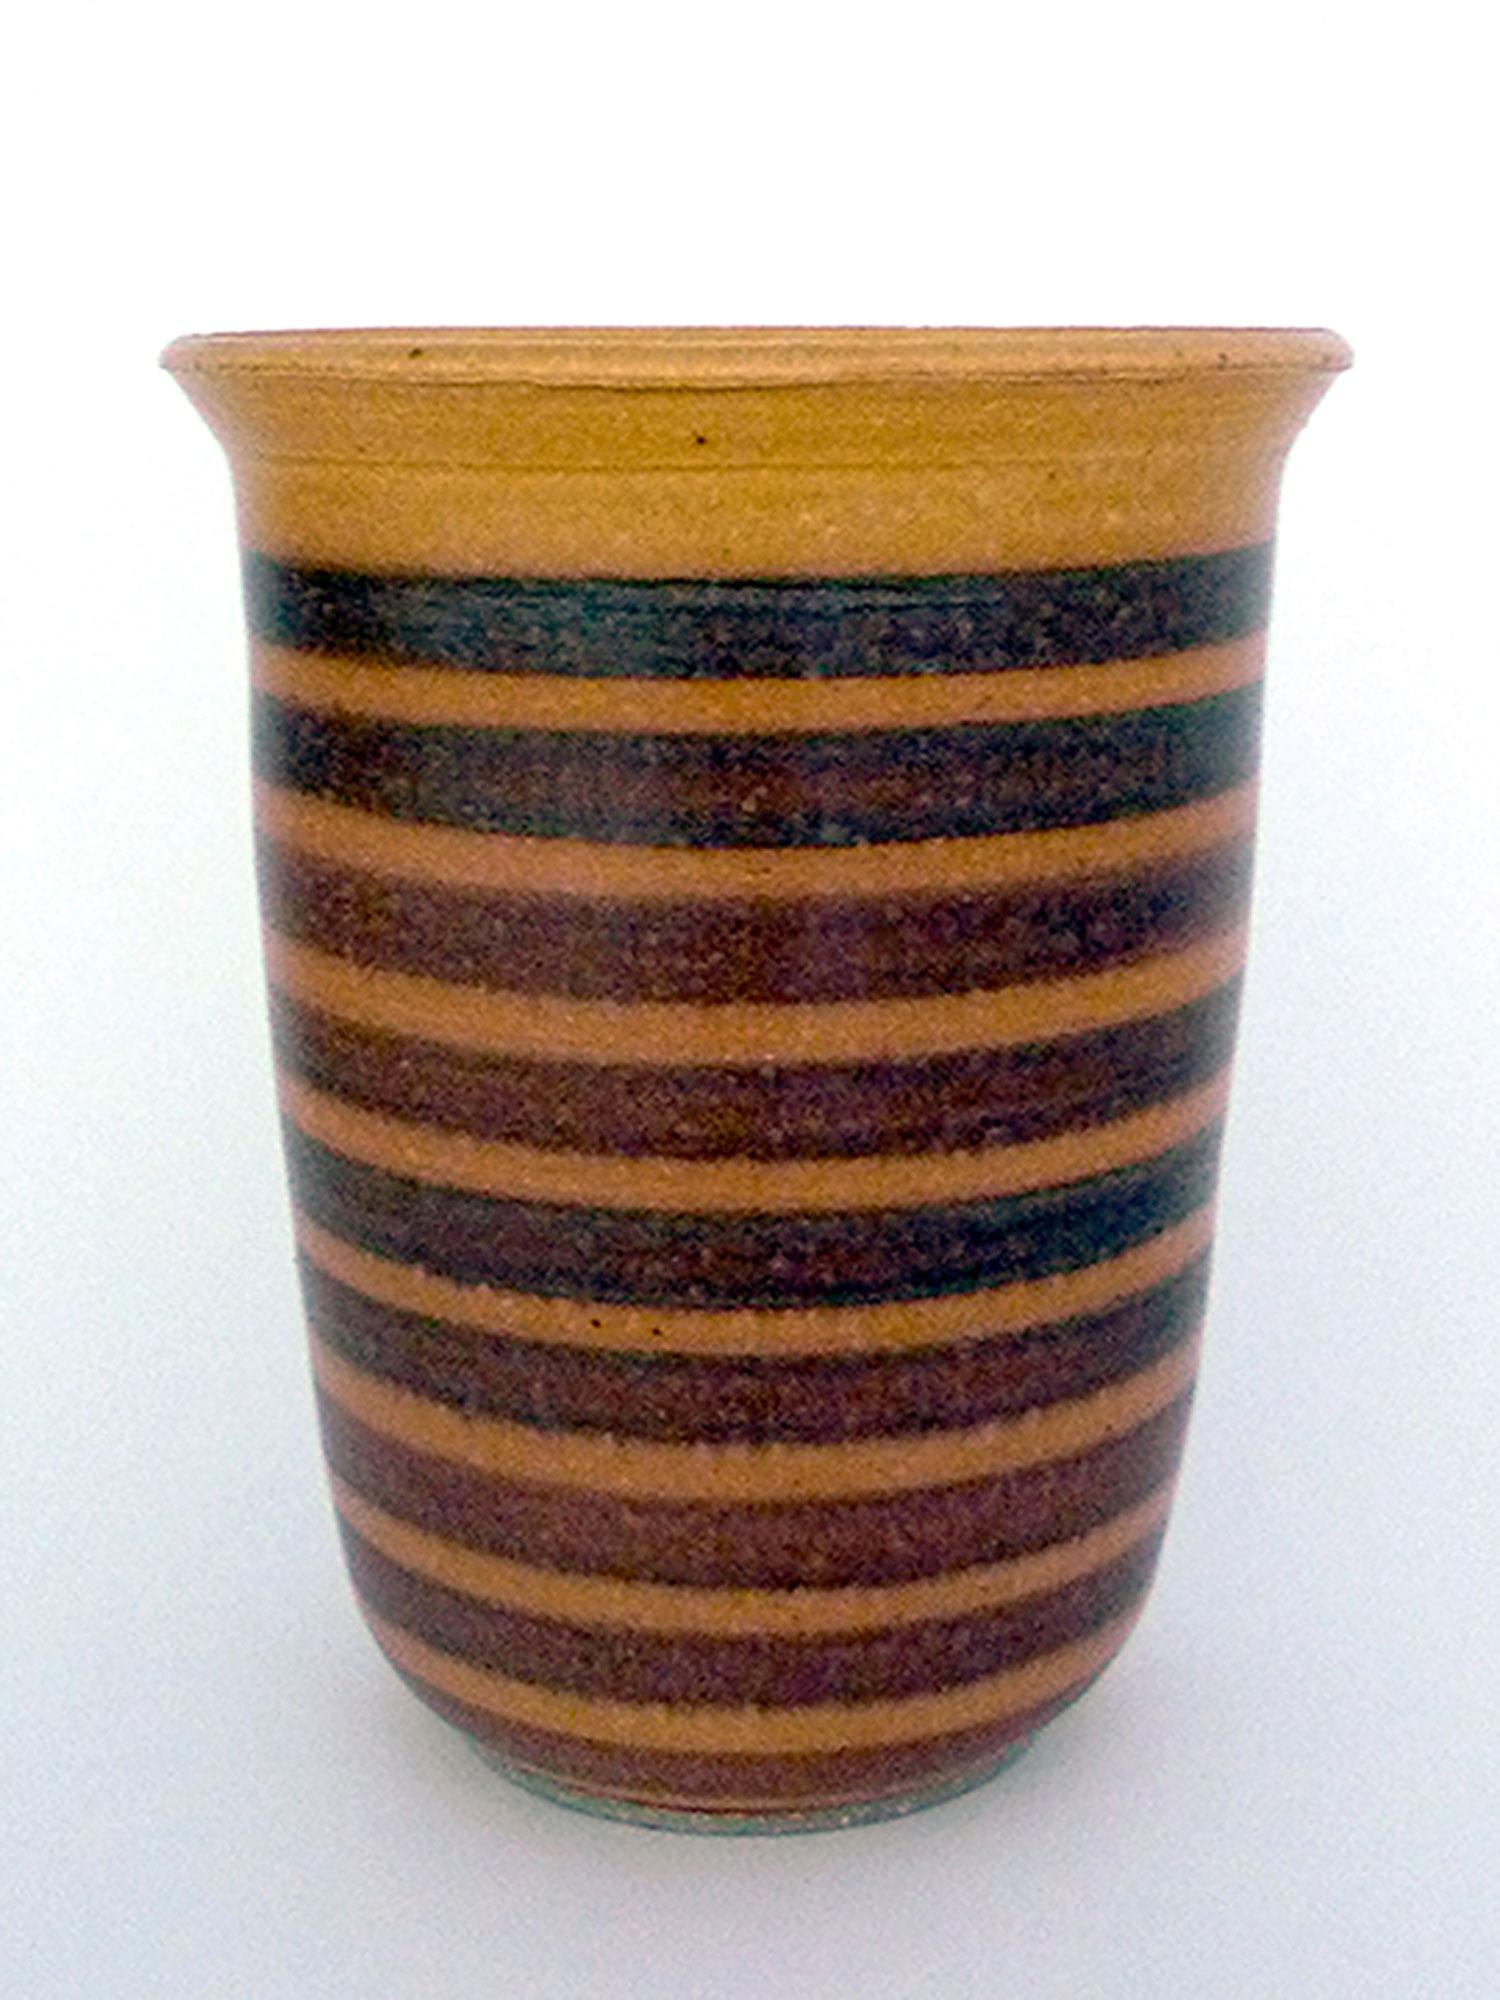 Beehive Vase